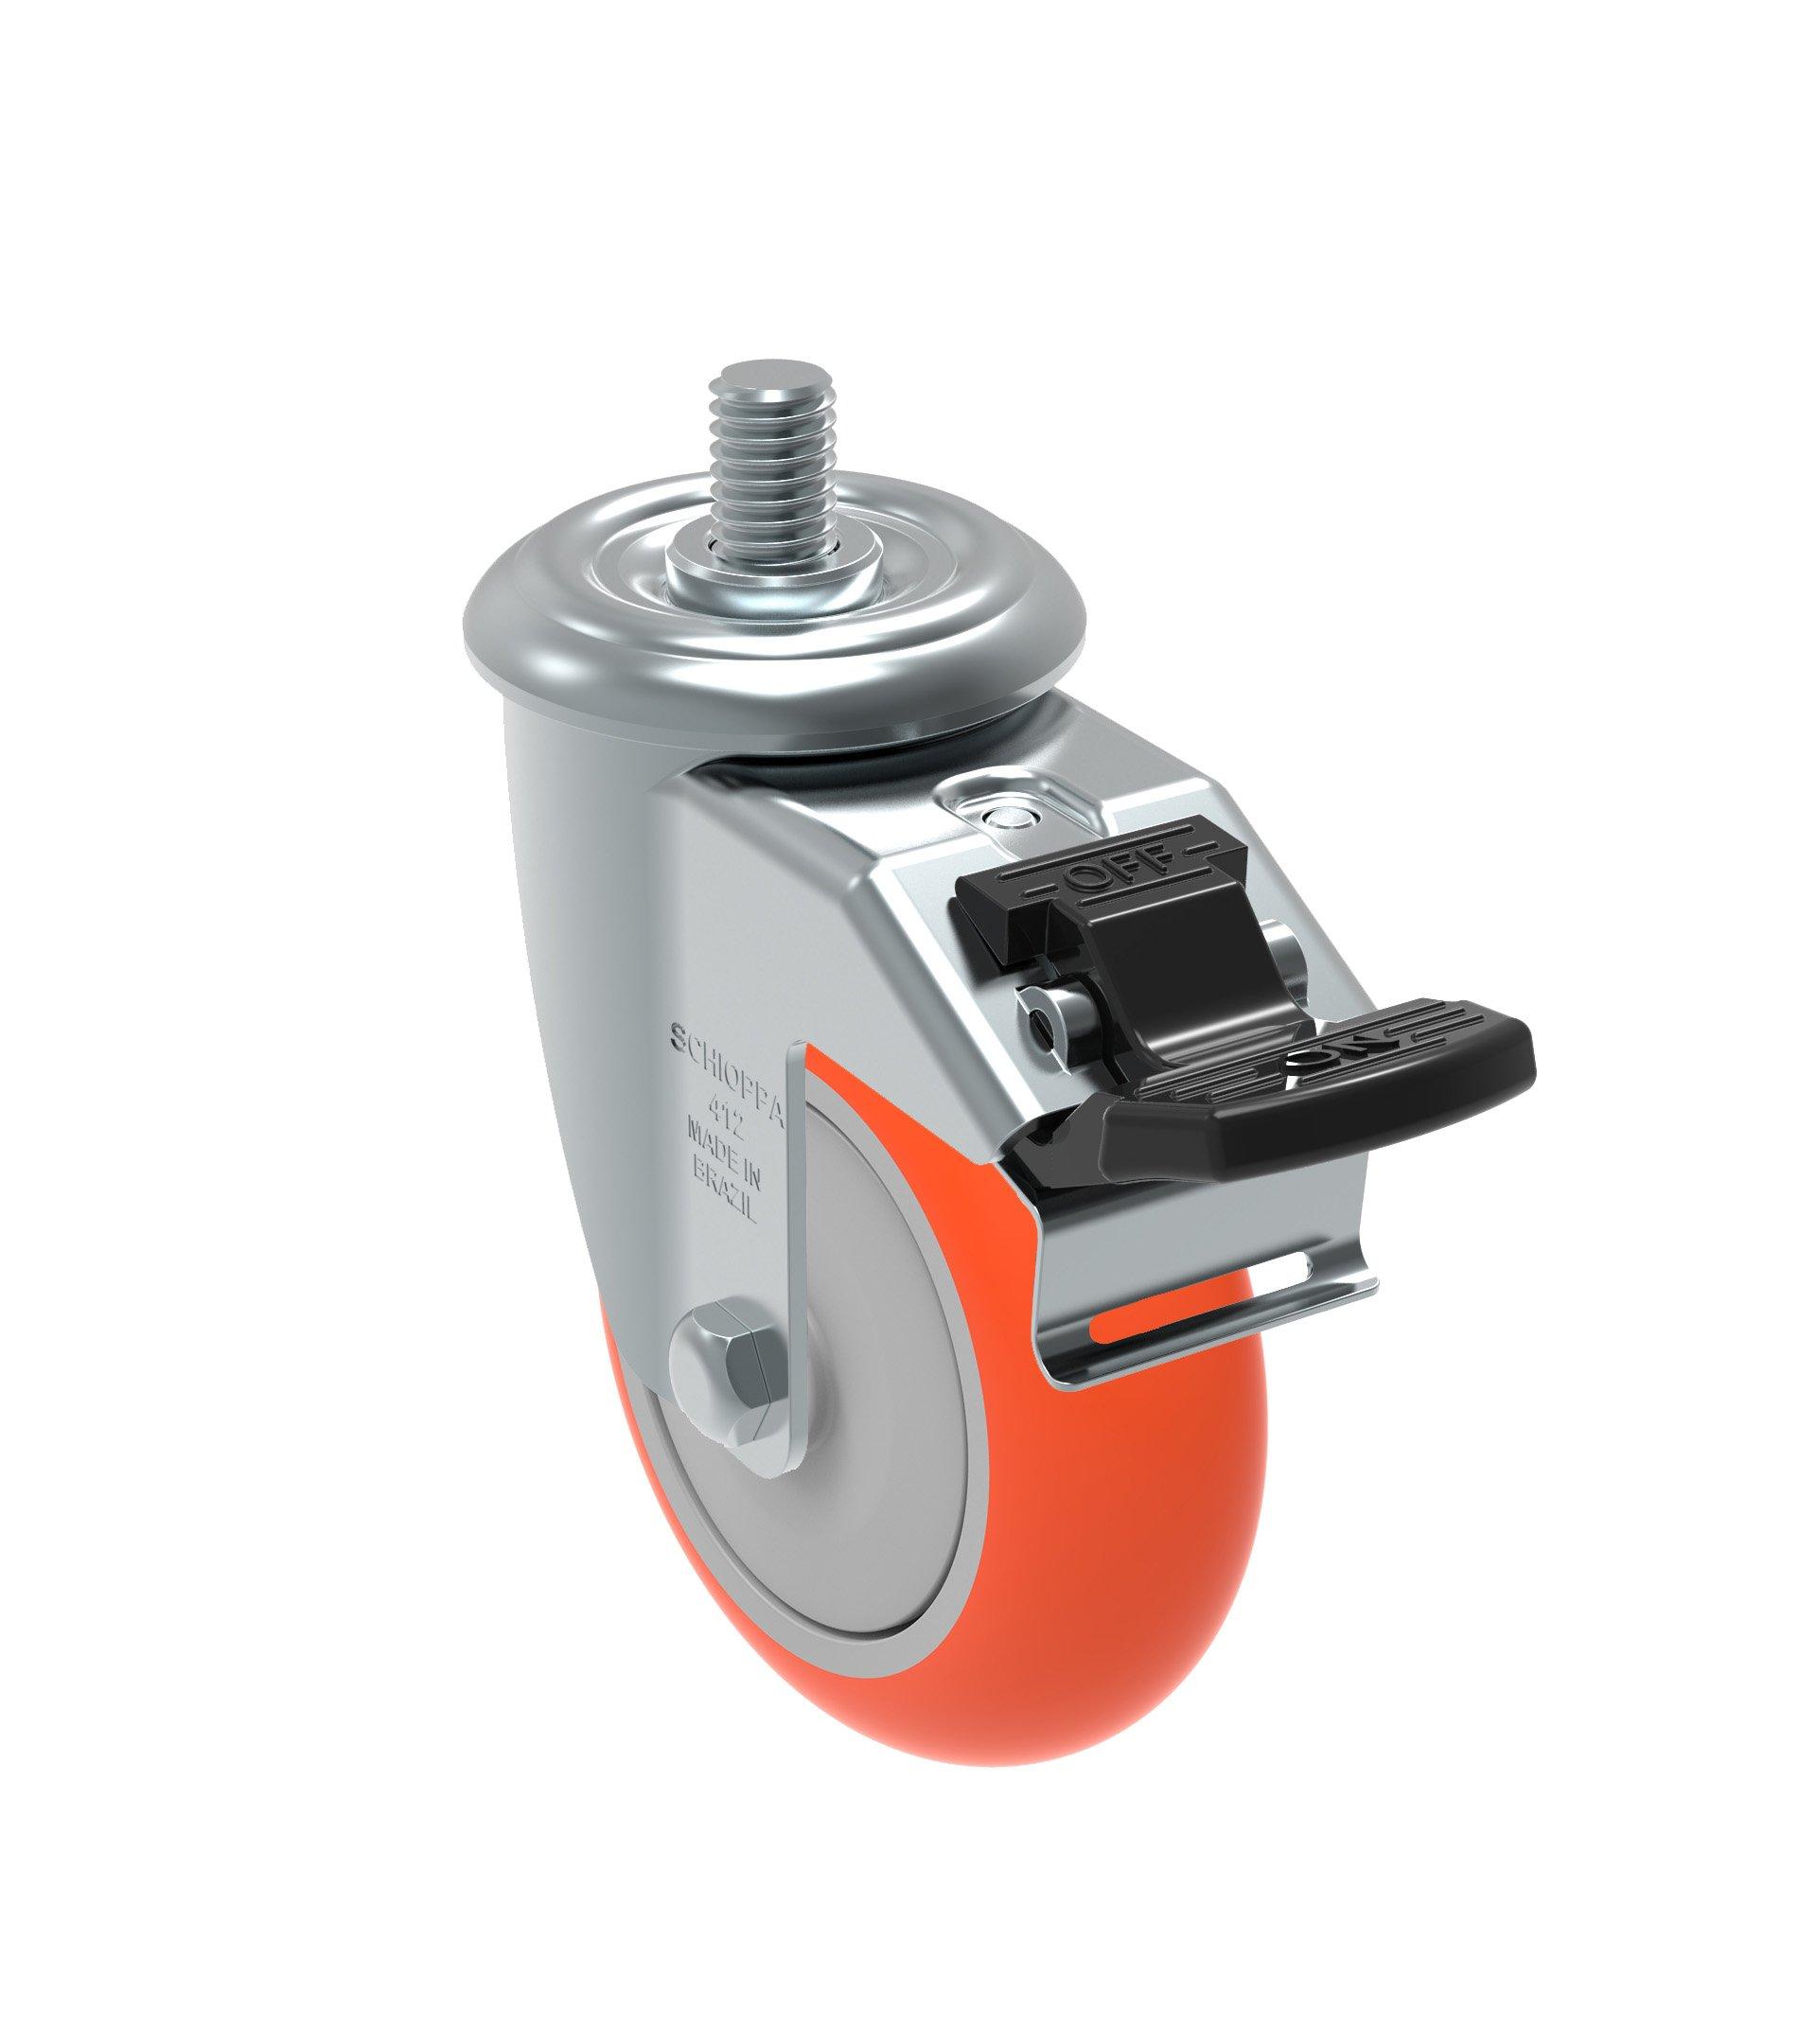 Schioppa GLEED 412 UPE G L12 Series 4'' x 1-1/4'' Diameter Swivel Caster with Total Lock Brake, Non-Marking Polyurethane Precision Ball Bearing Wheel, 3/8'' Diameter x 1'' Length Threaded Stem, 275 lb